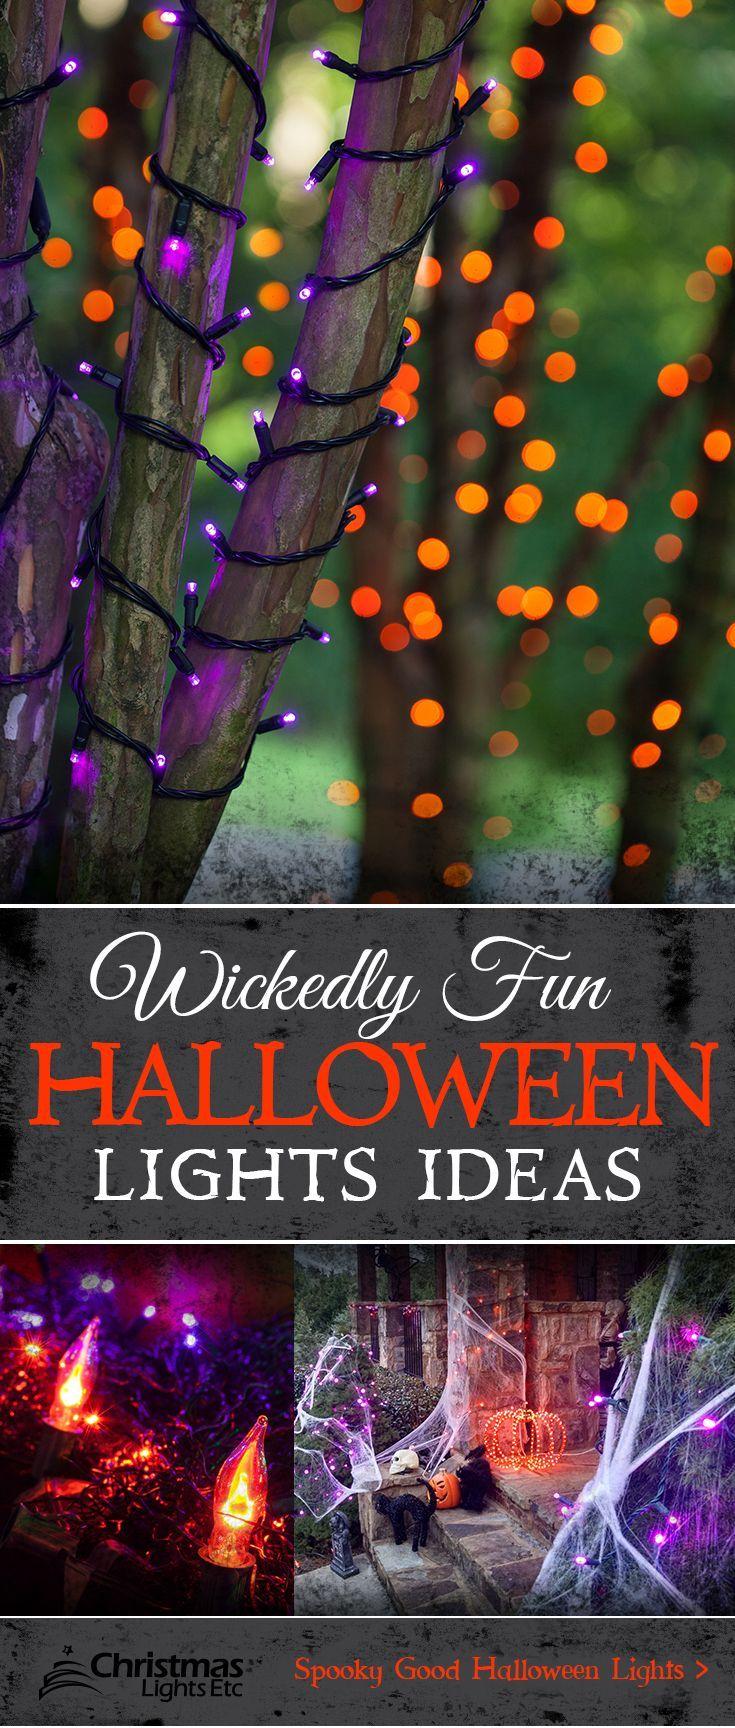 54 best Halloween lighting images on Pinterest